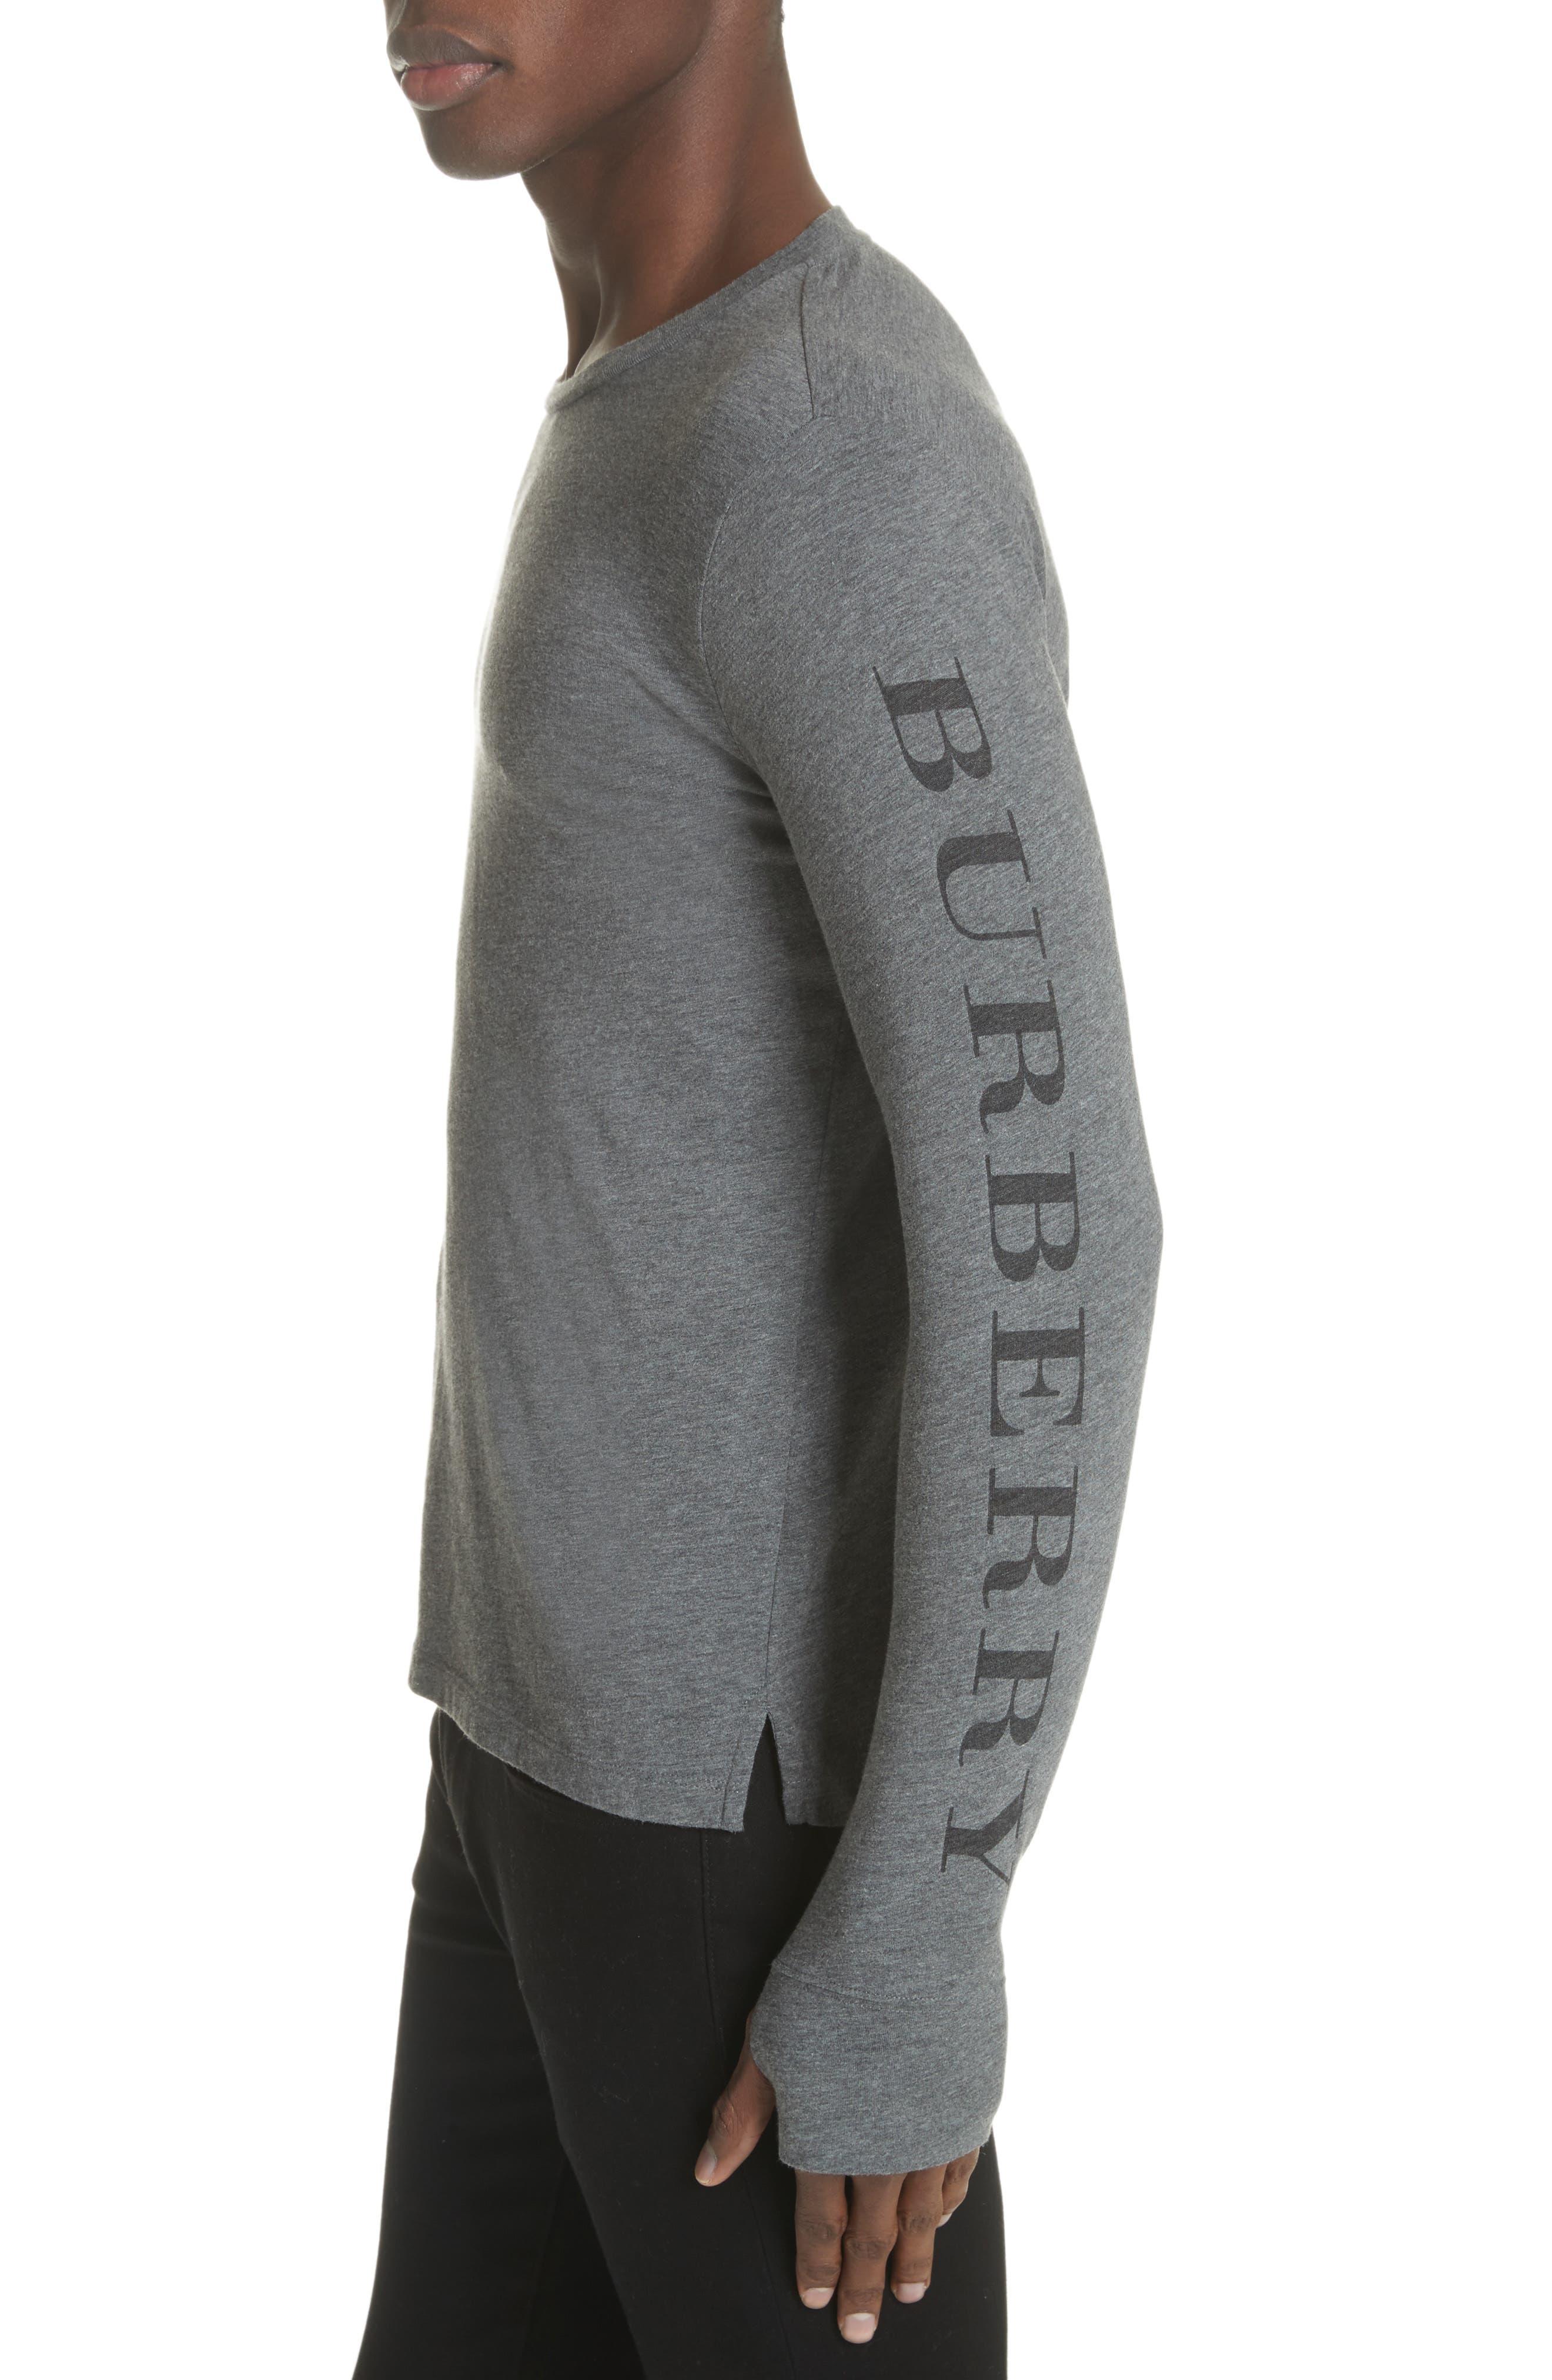 Marchston Regular Fit Crewneck Shirt,                             Alternate thumbnail 4, color,                             Mid Grey Melange